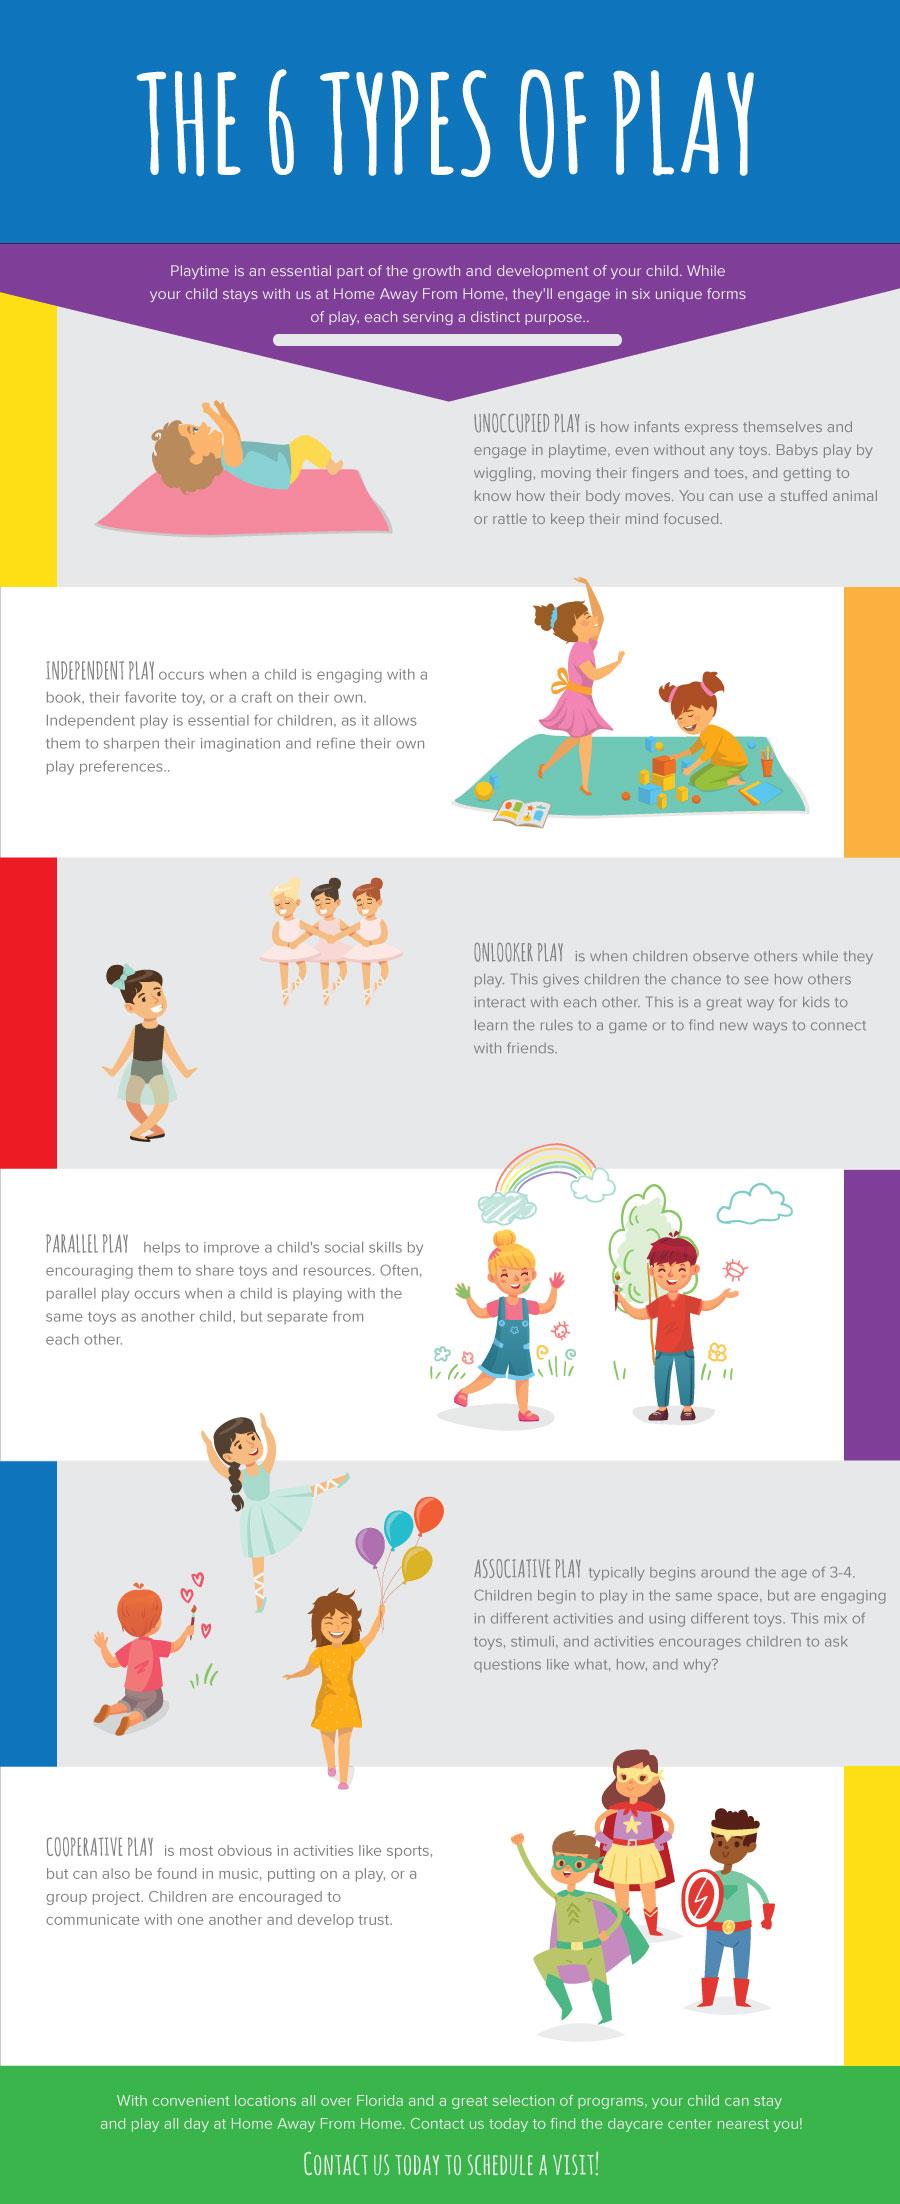 6 Types of Play - 6TypesofPlay 5dfbda461bab2